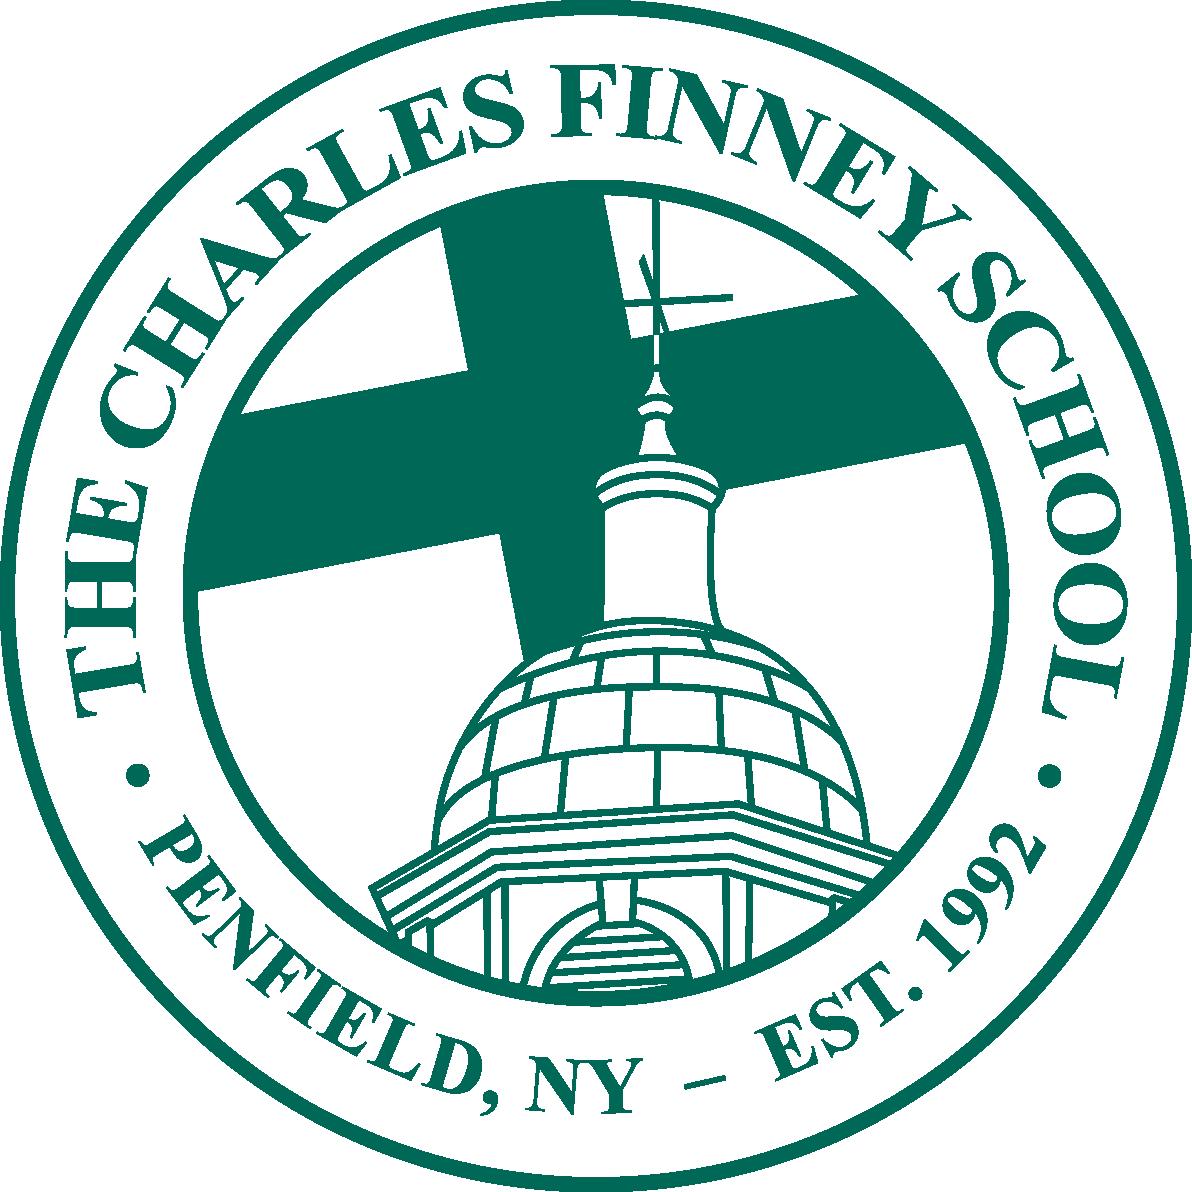 New York- Trường Trung Học The Charles Finney School- USA